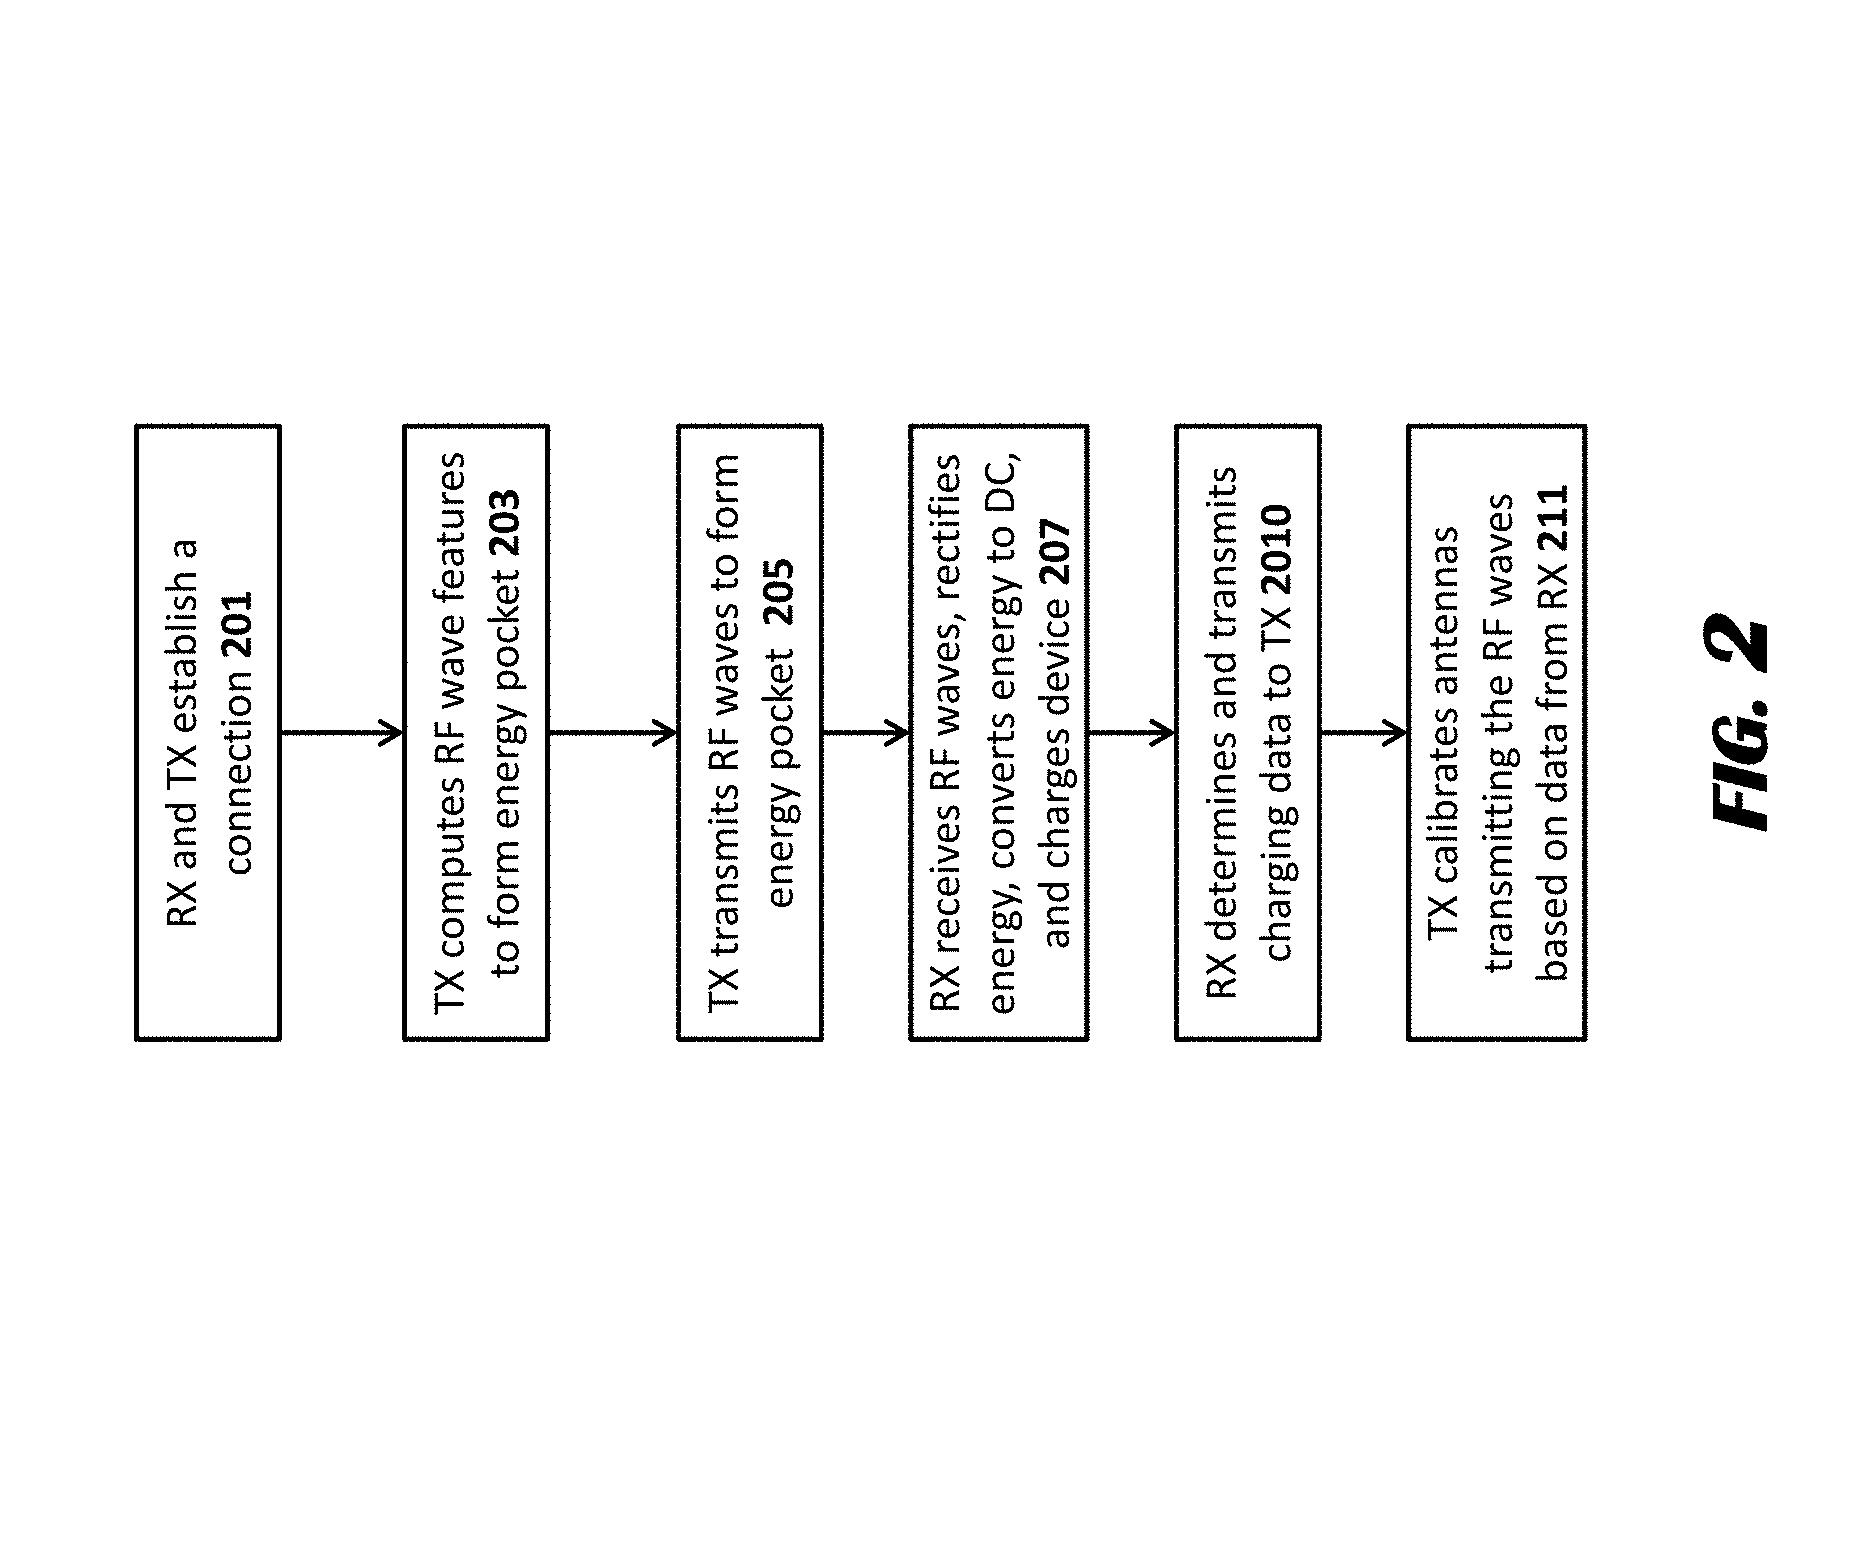 Patent US 9,954,374 B1